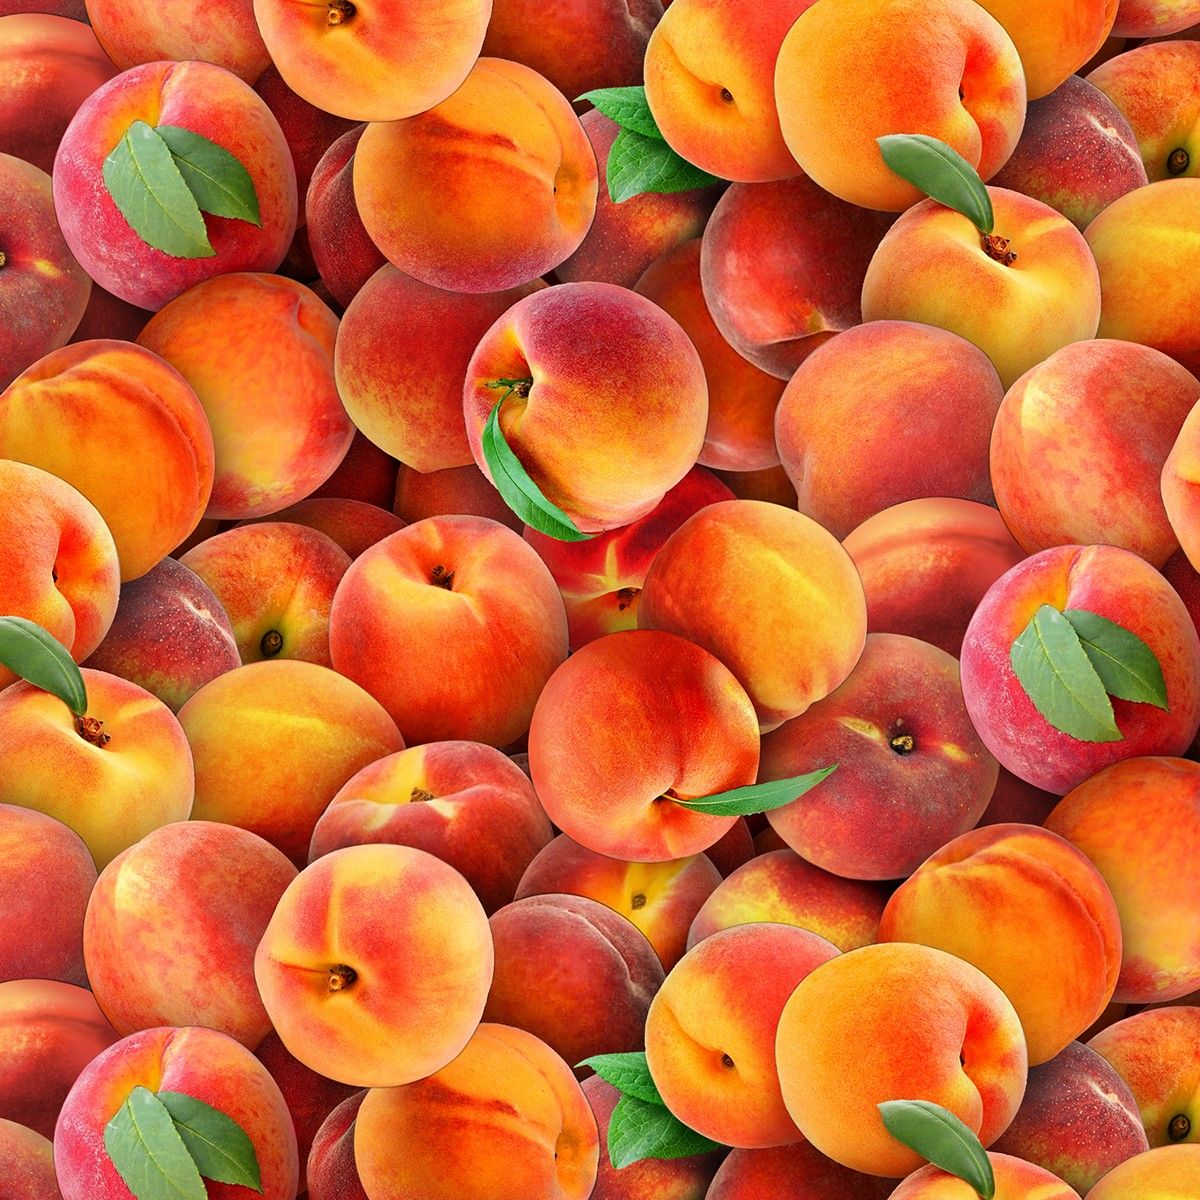 Multi Peaches 15yds, 100 Cotton, 44/45in Peach fruit